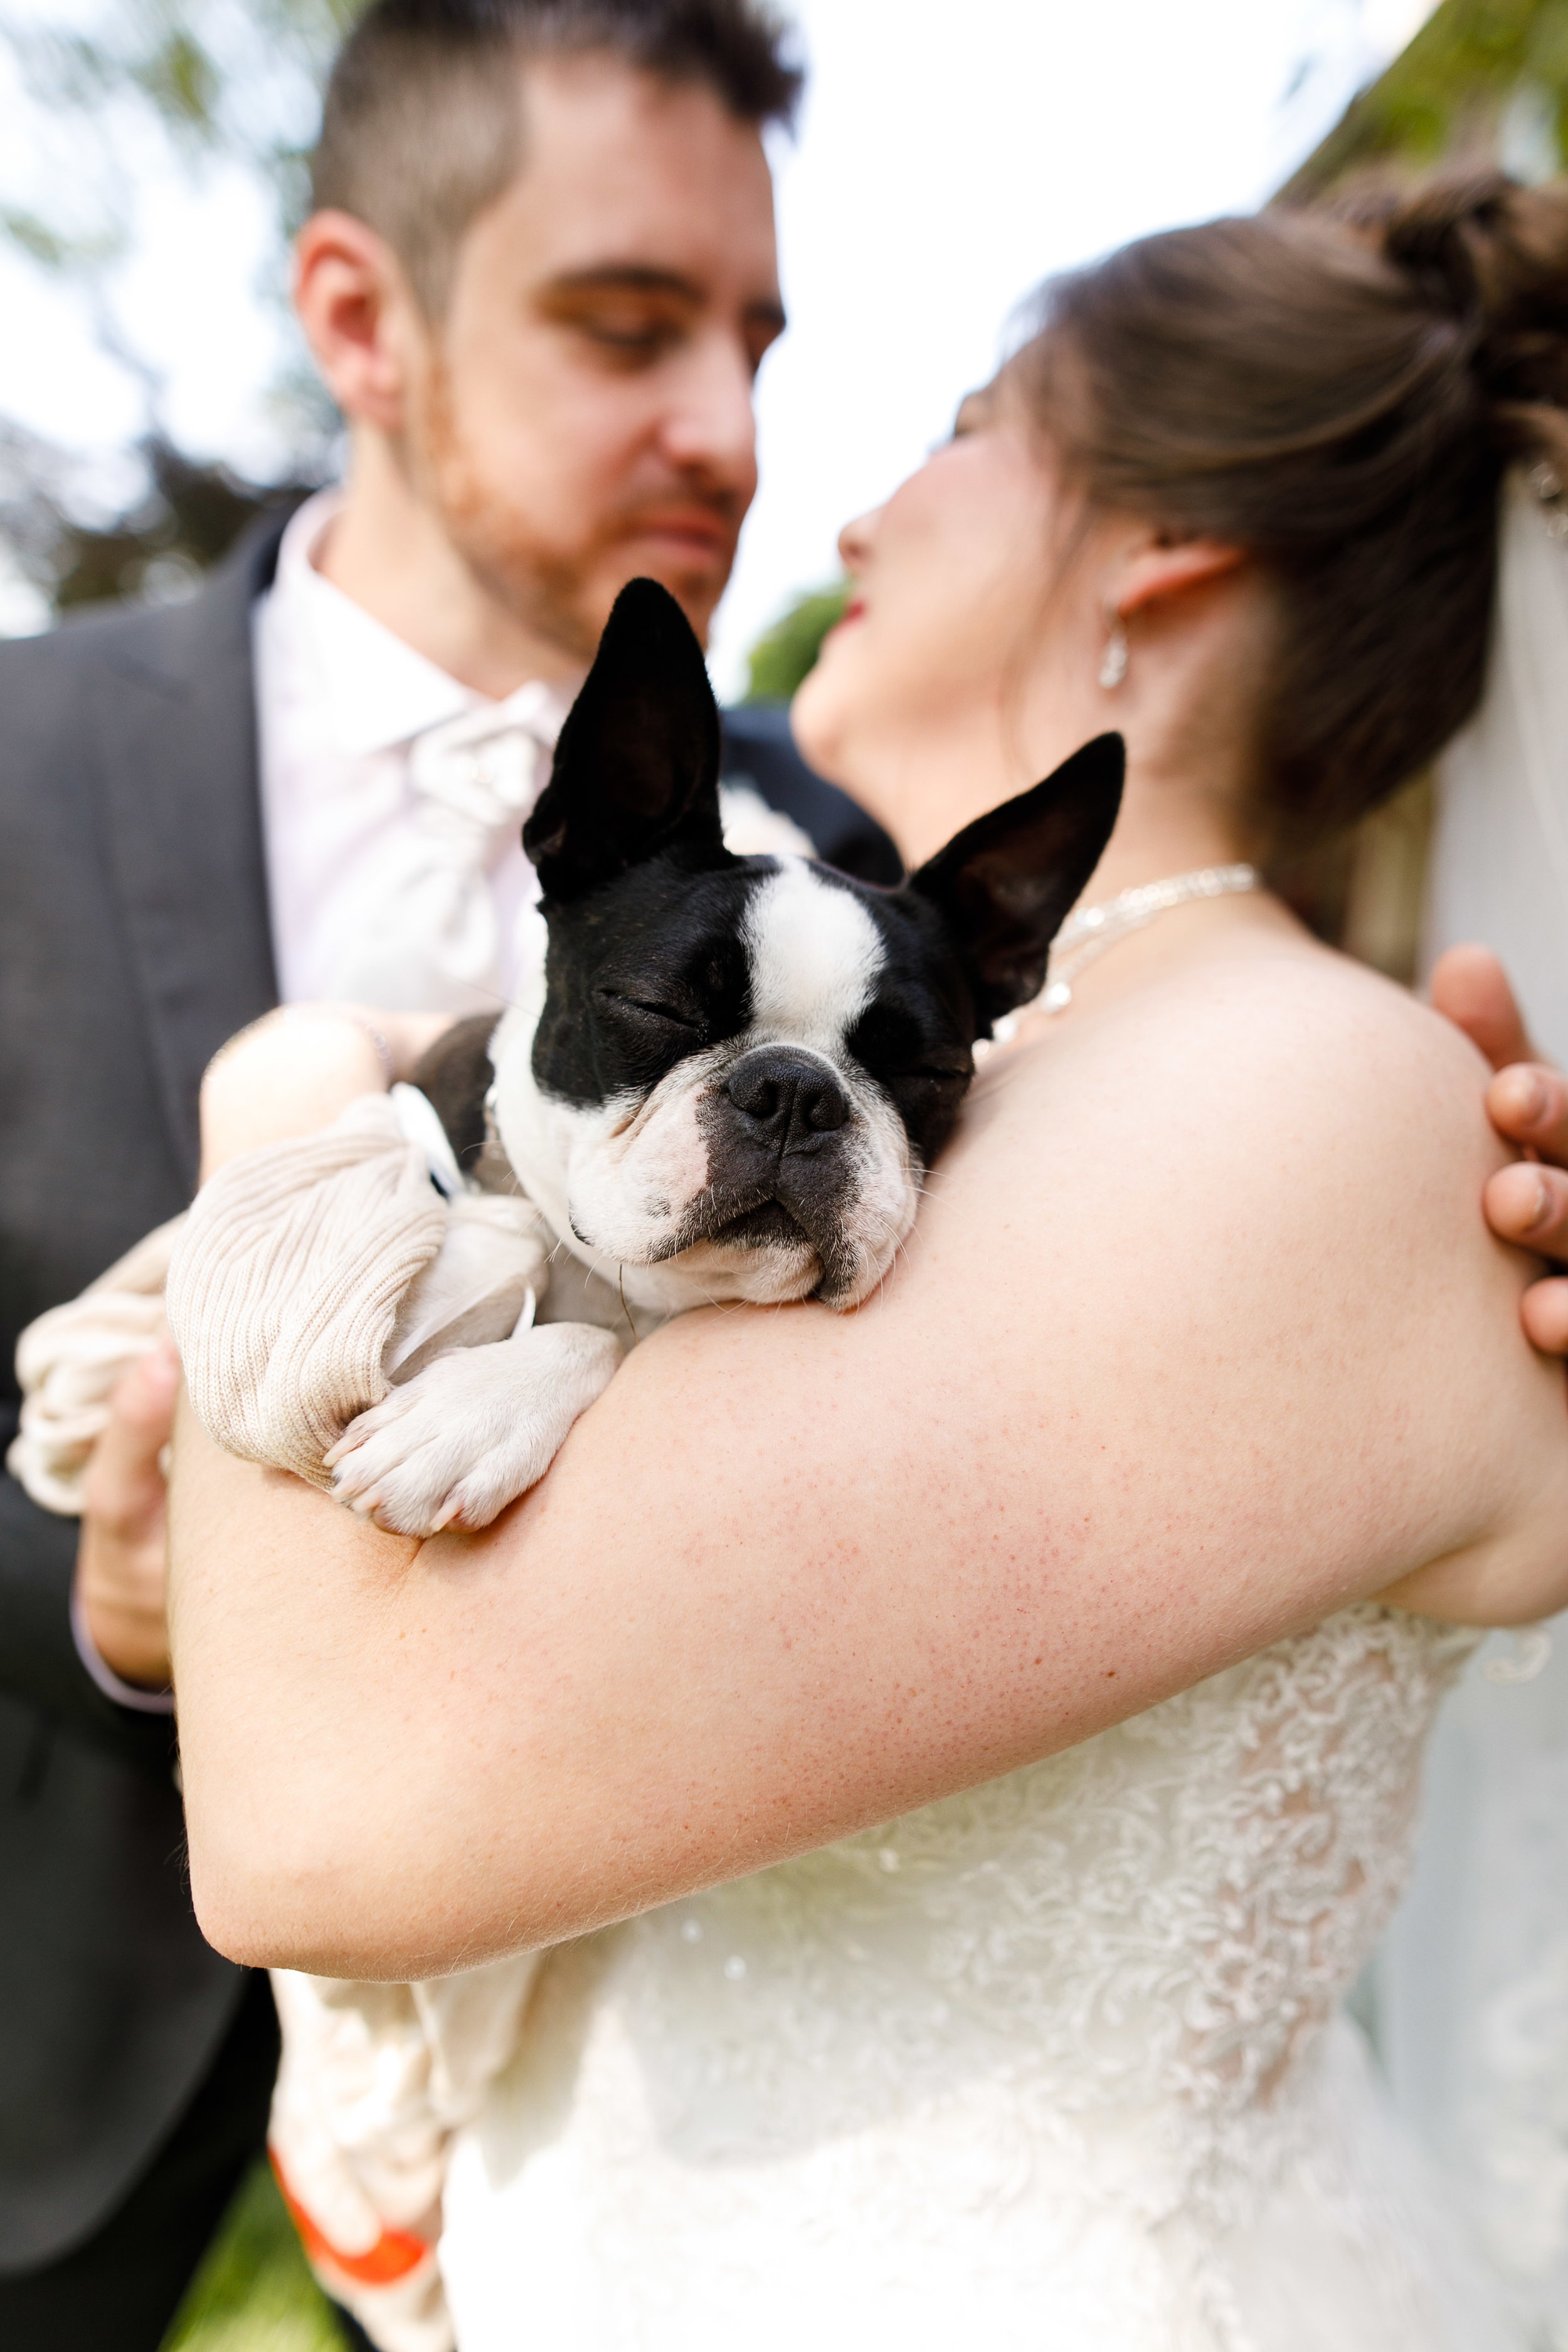 Wedding at Joseph Ambler In Bucks County PA26.jpg